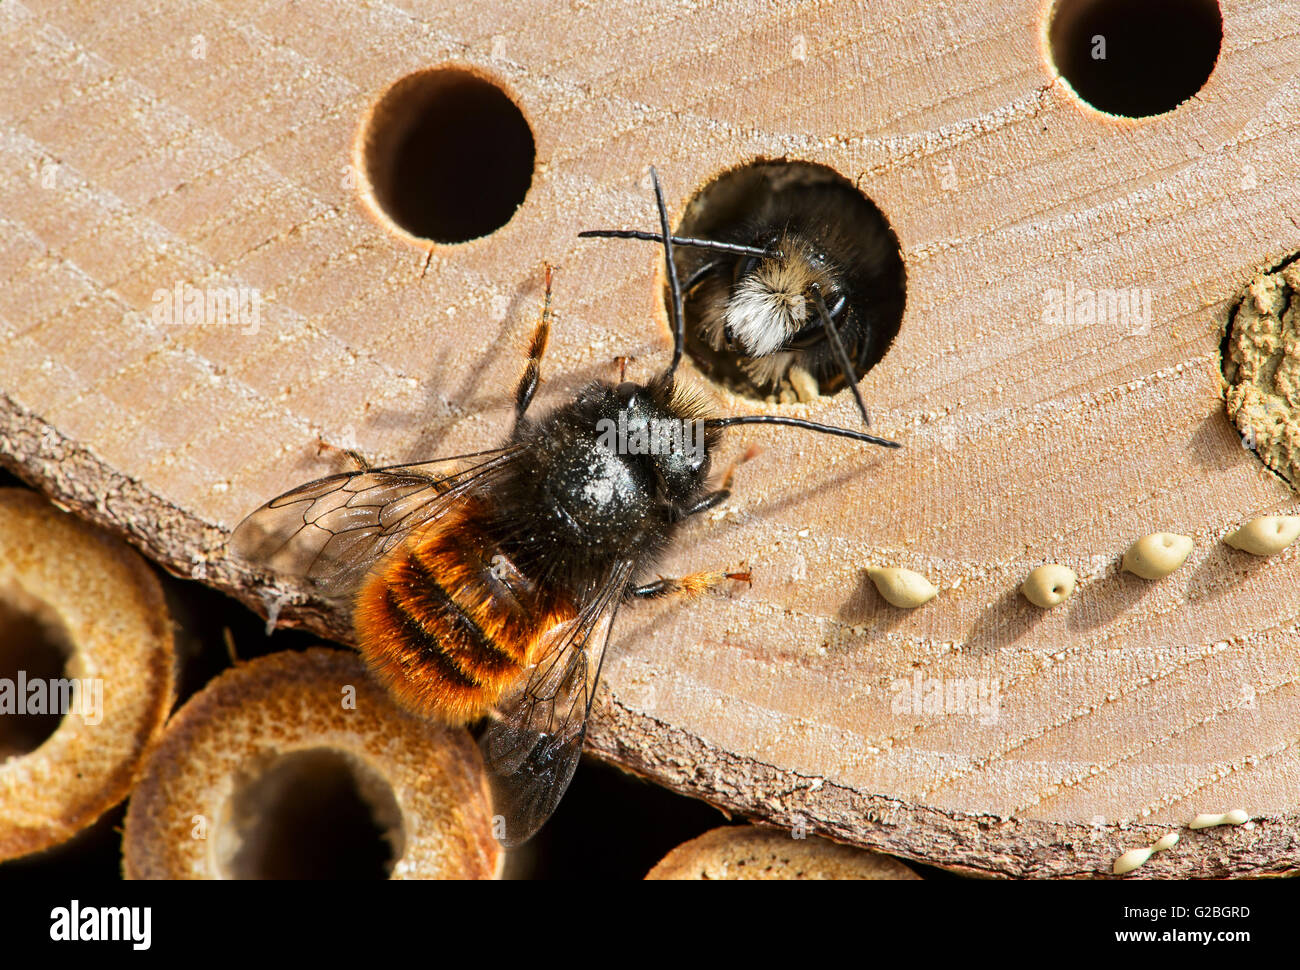 Hatching red mason bee (Osmia bicornis), familiy of Megachilidae (Megachilidae), Bee Hotel, artificial breeding - Stock Image